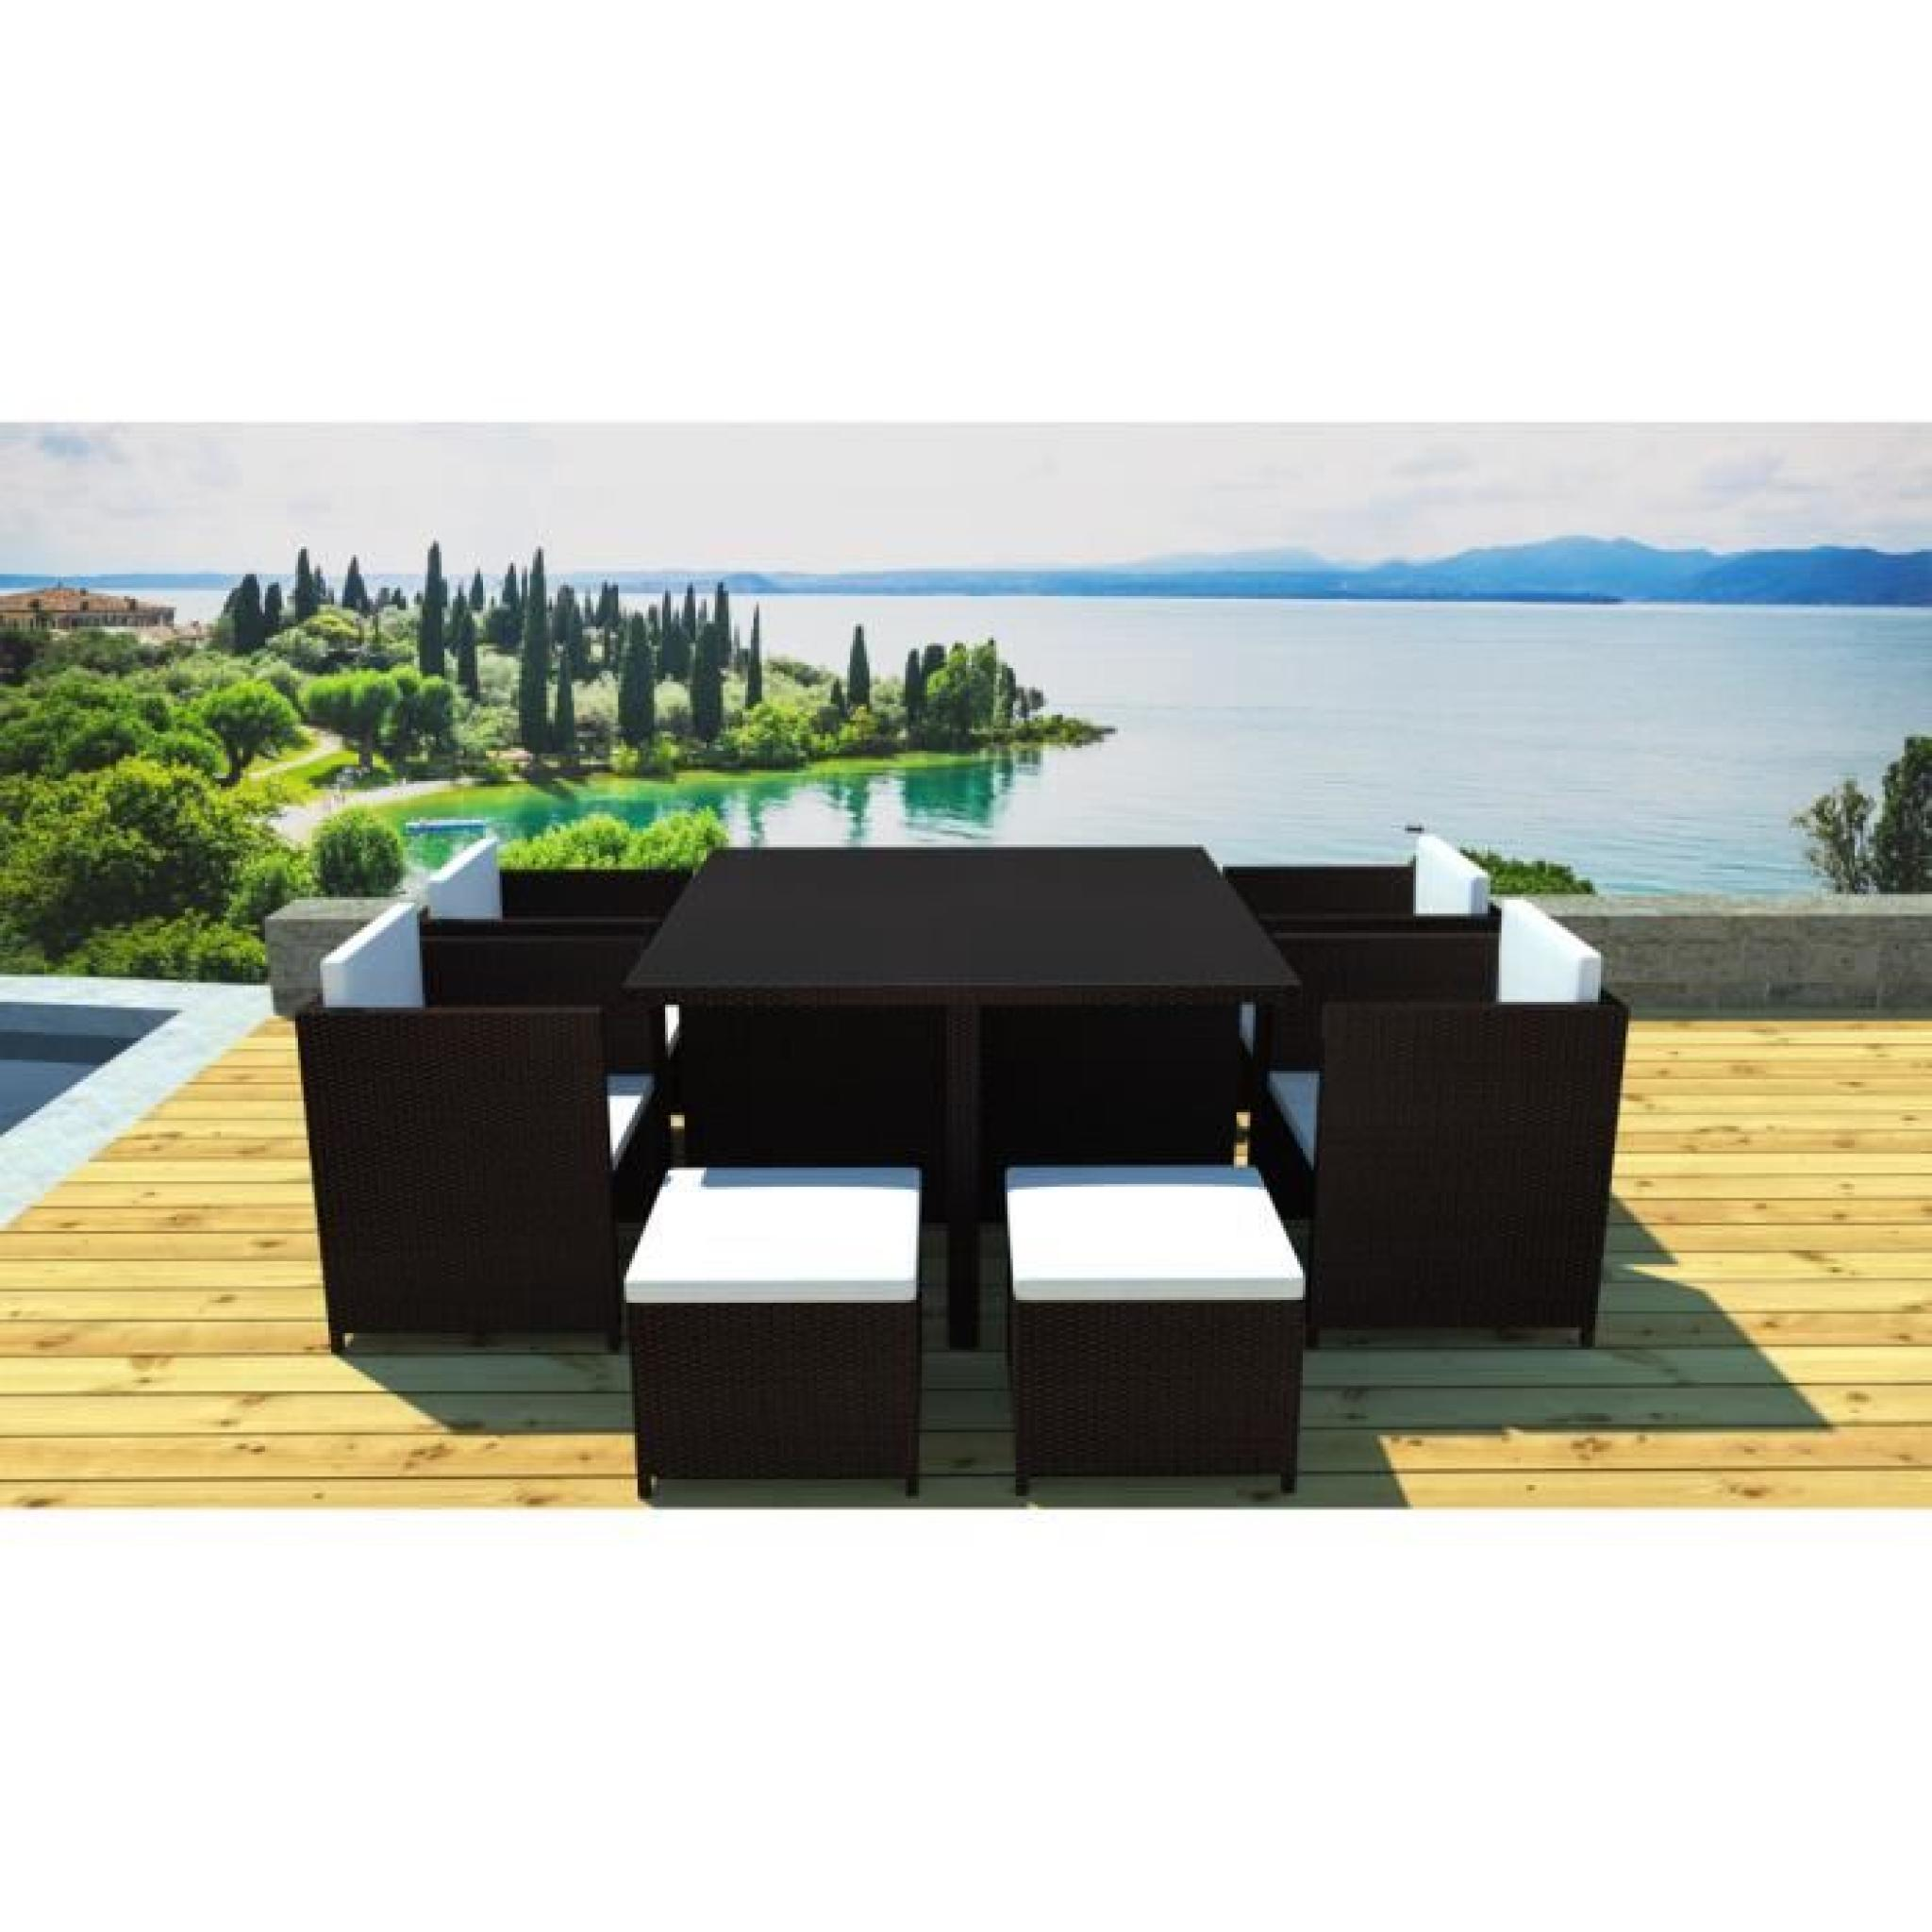 salon de jardin r sine encastrable 8 places chocolat cru. Black Bedroom Furniture Sets. Home Design Ideas